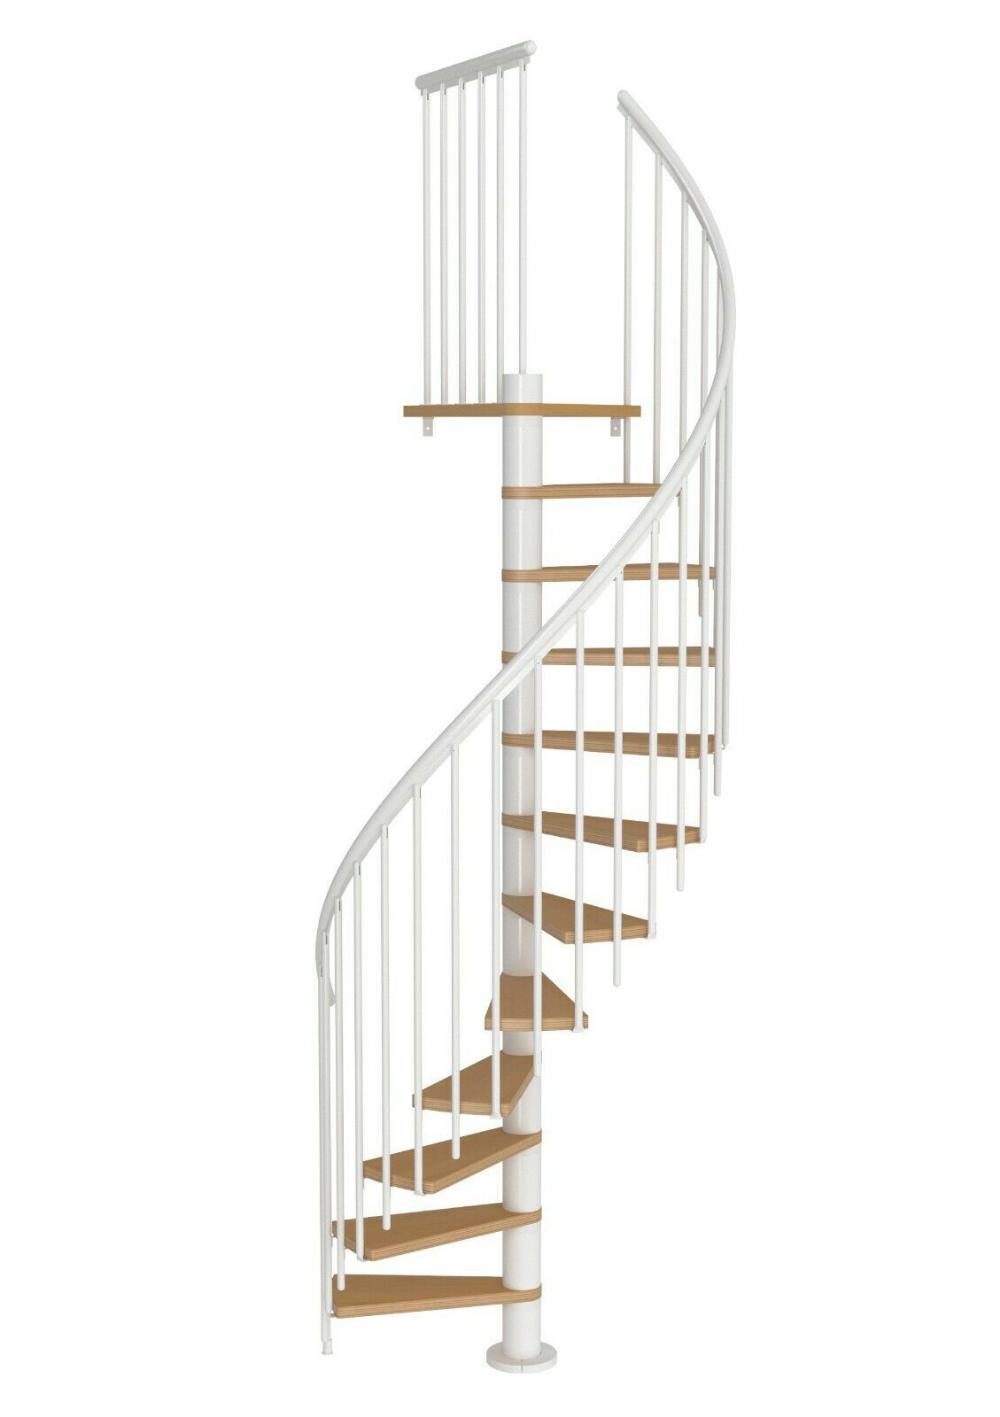 Best Dolle Calgary White Loft Spiral Staircase Kit 1200Mm 400 x 300